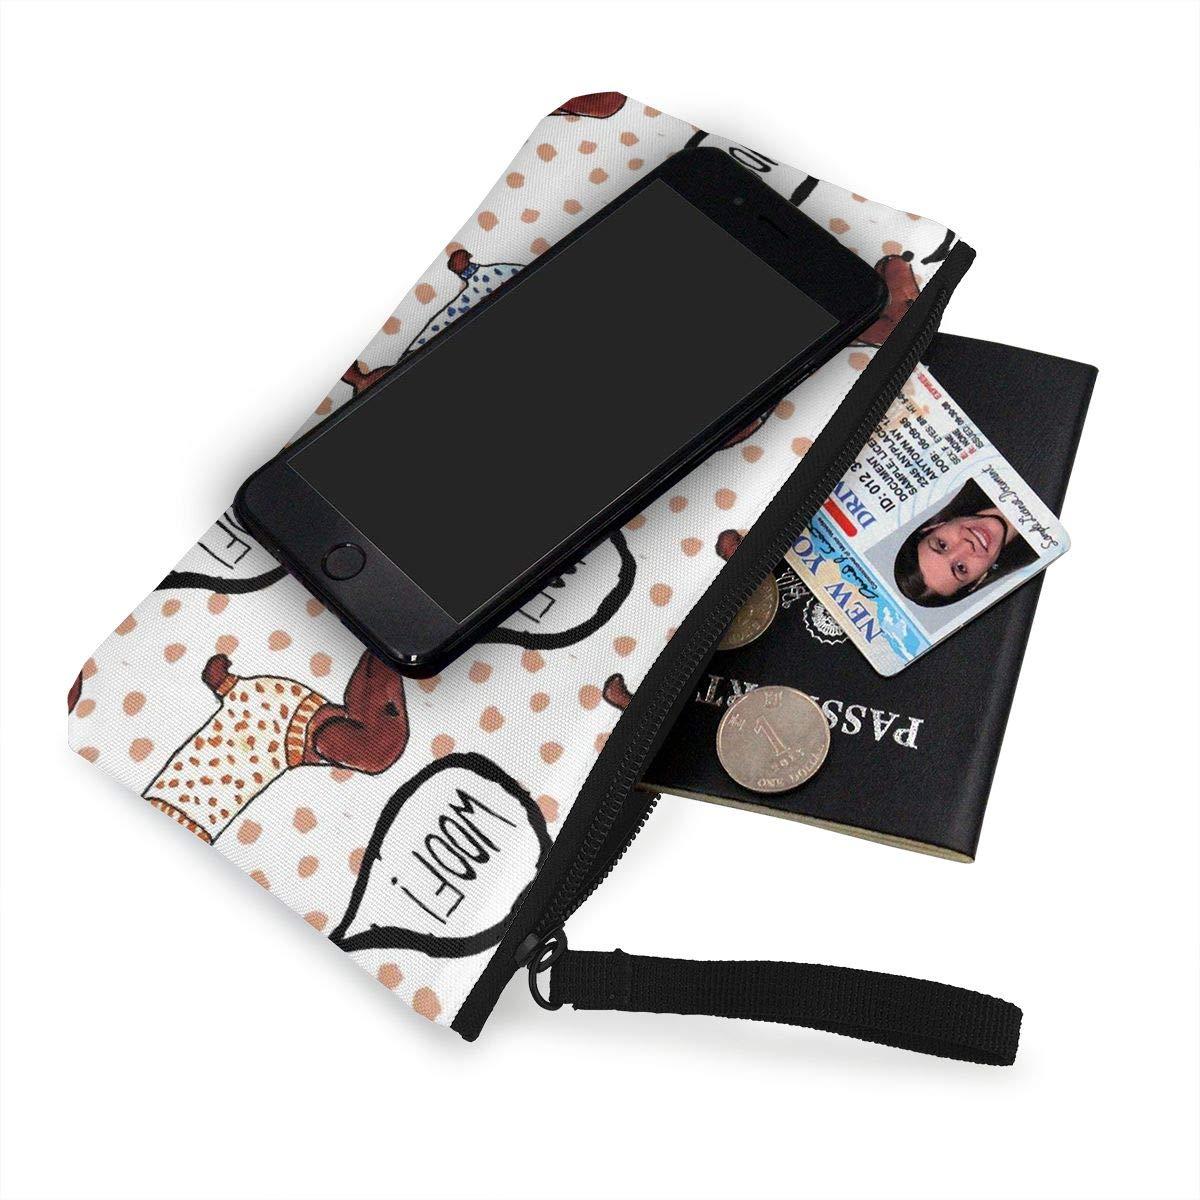 Coin Pouch Dachshund Fun Canvas Coin Purse Cellphone Card Bag With Handle And Zipper